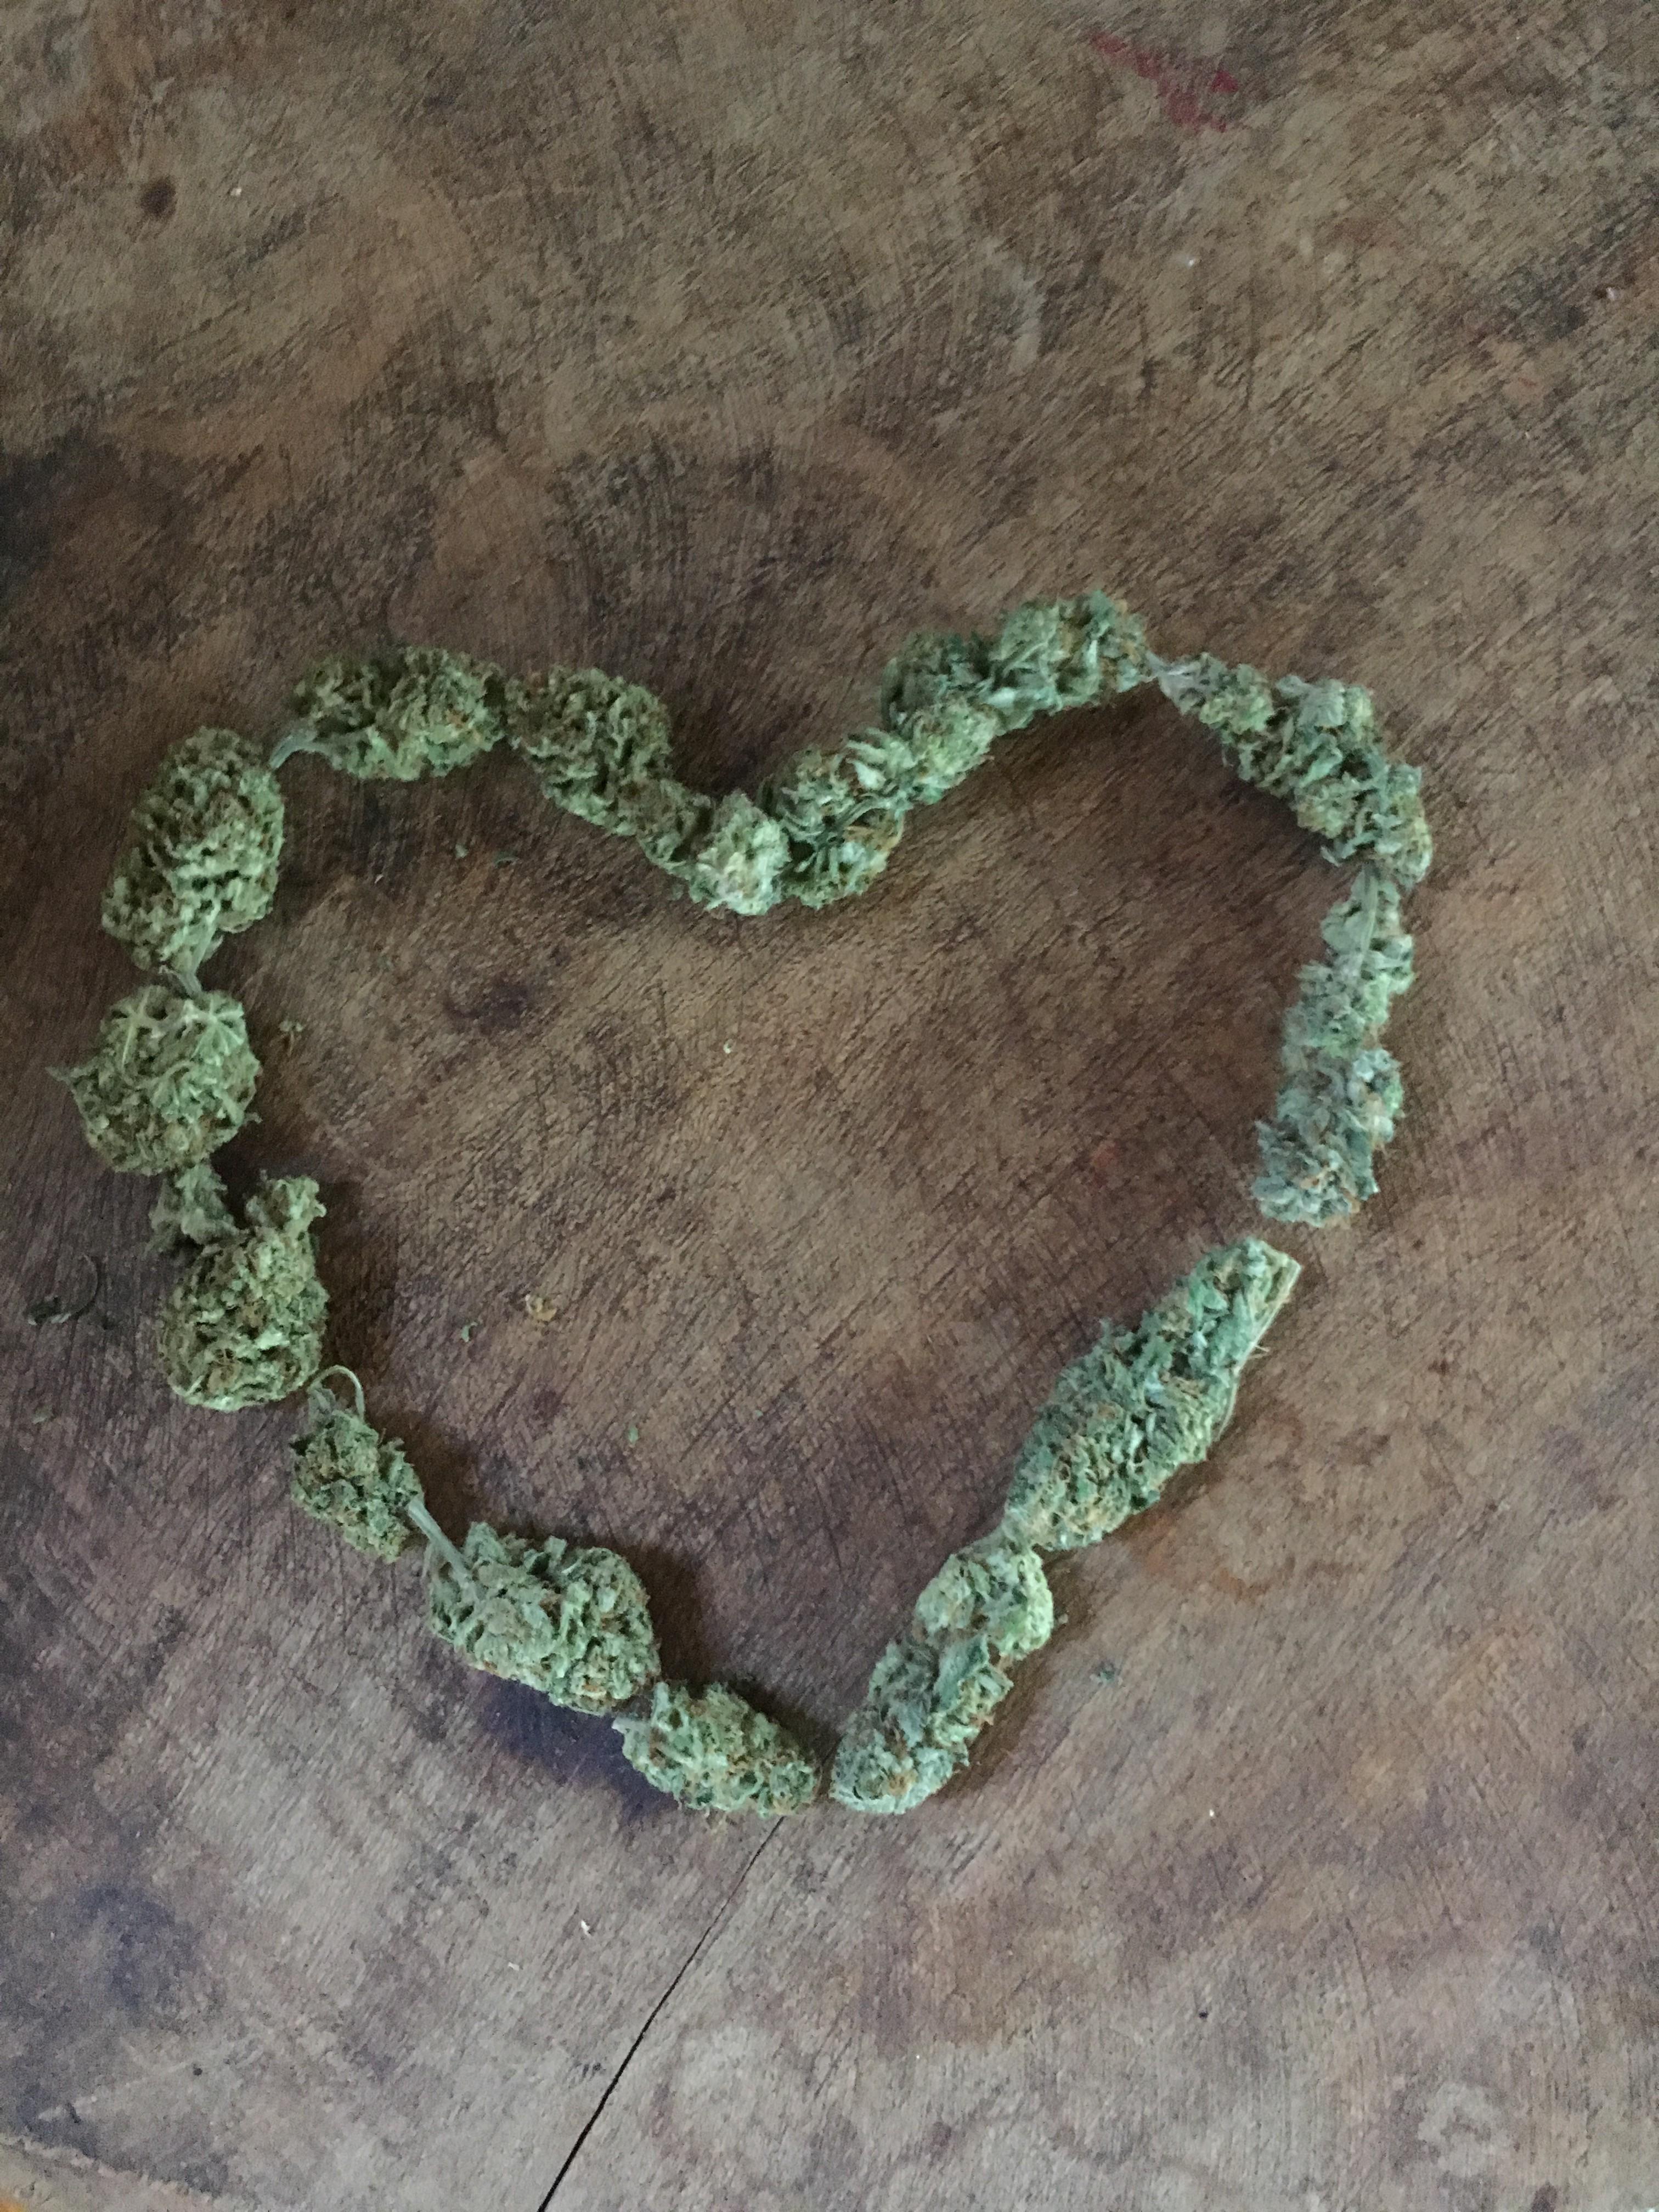 Washington Marijuana Sales Surpass $1.25B